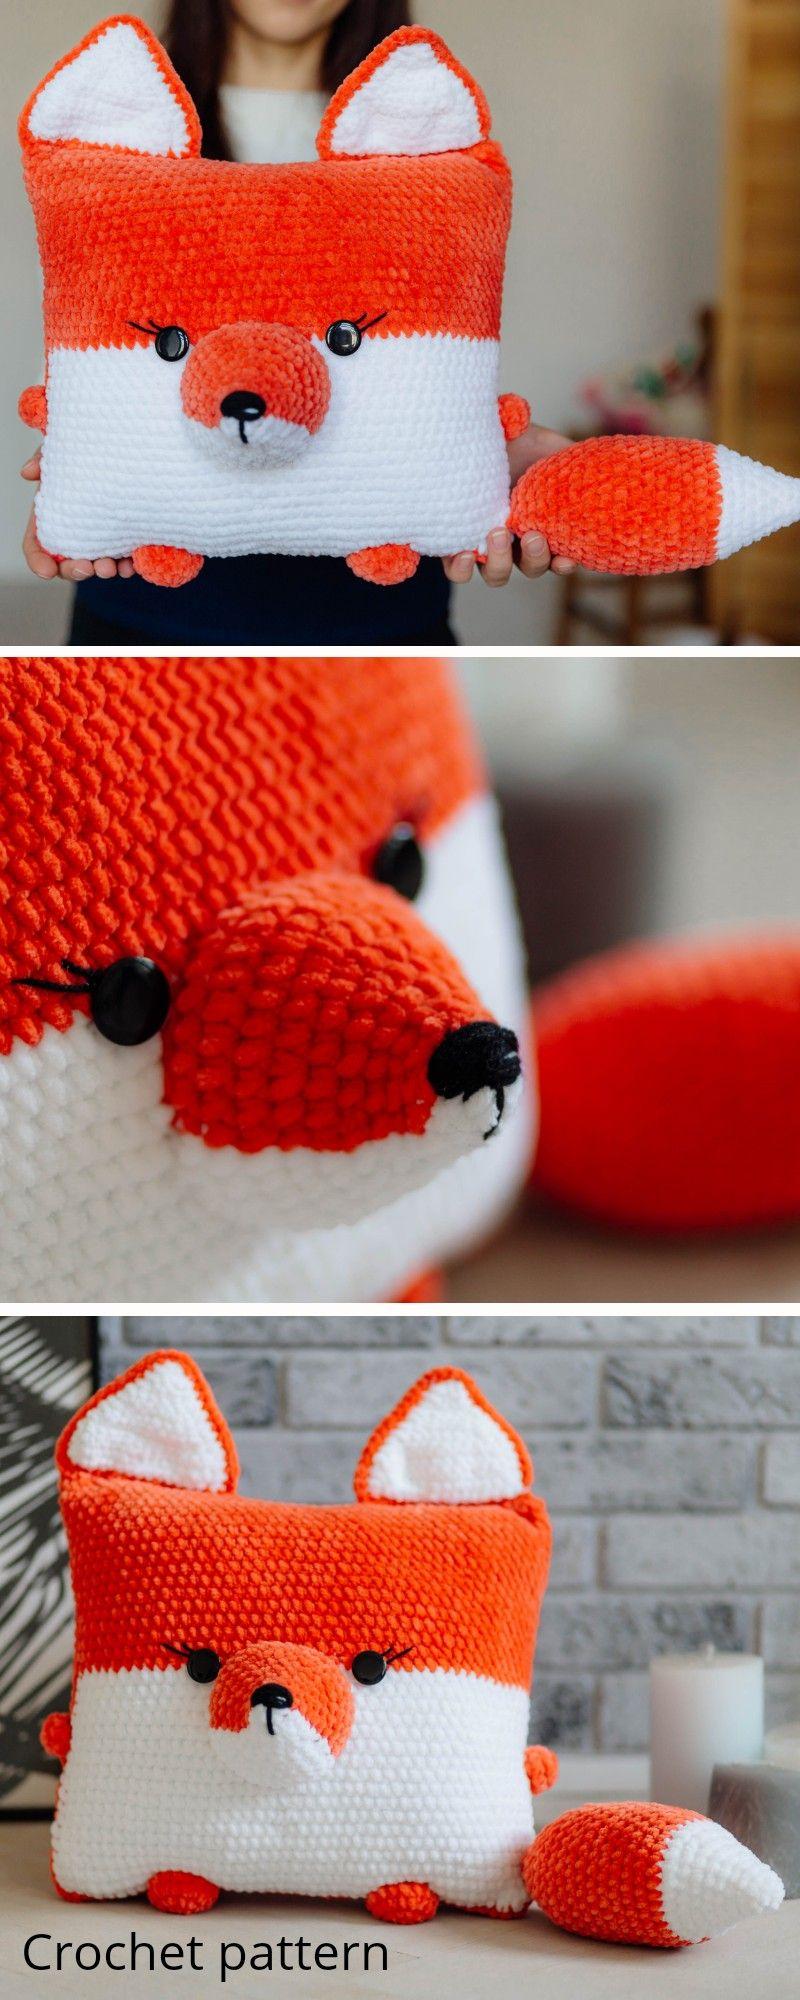 Crochet pattern fox, amigurumi fox pattern, crochet pillow pattern, crochet toy, crochet decor, fox